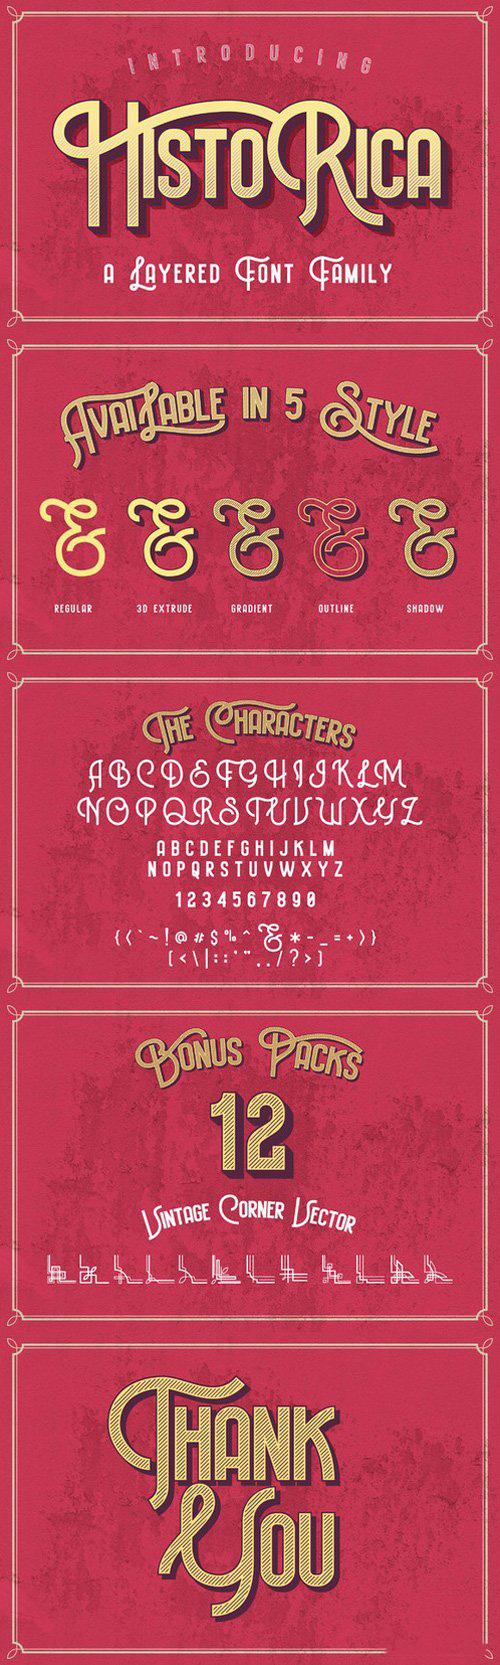 Historica Typeface